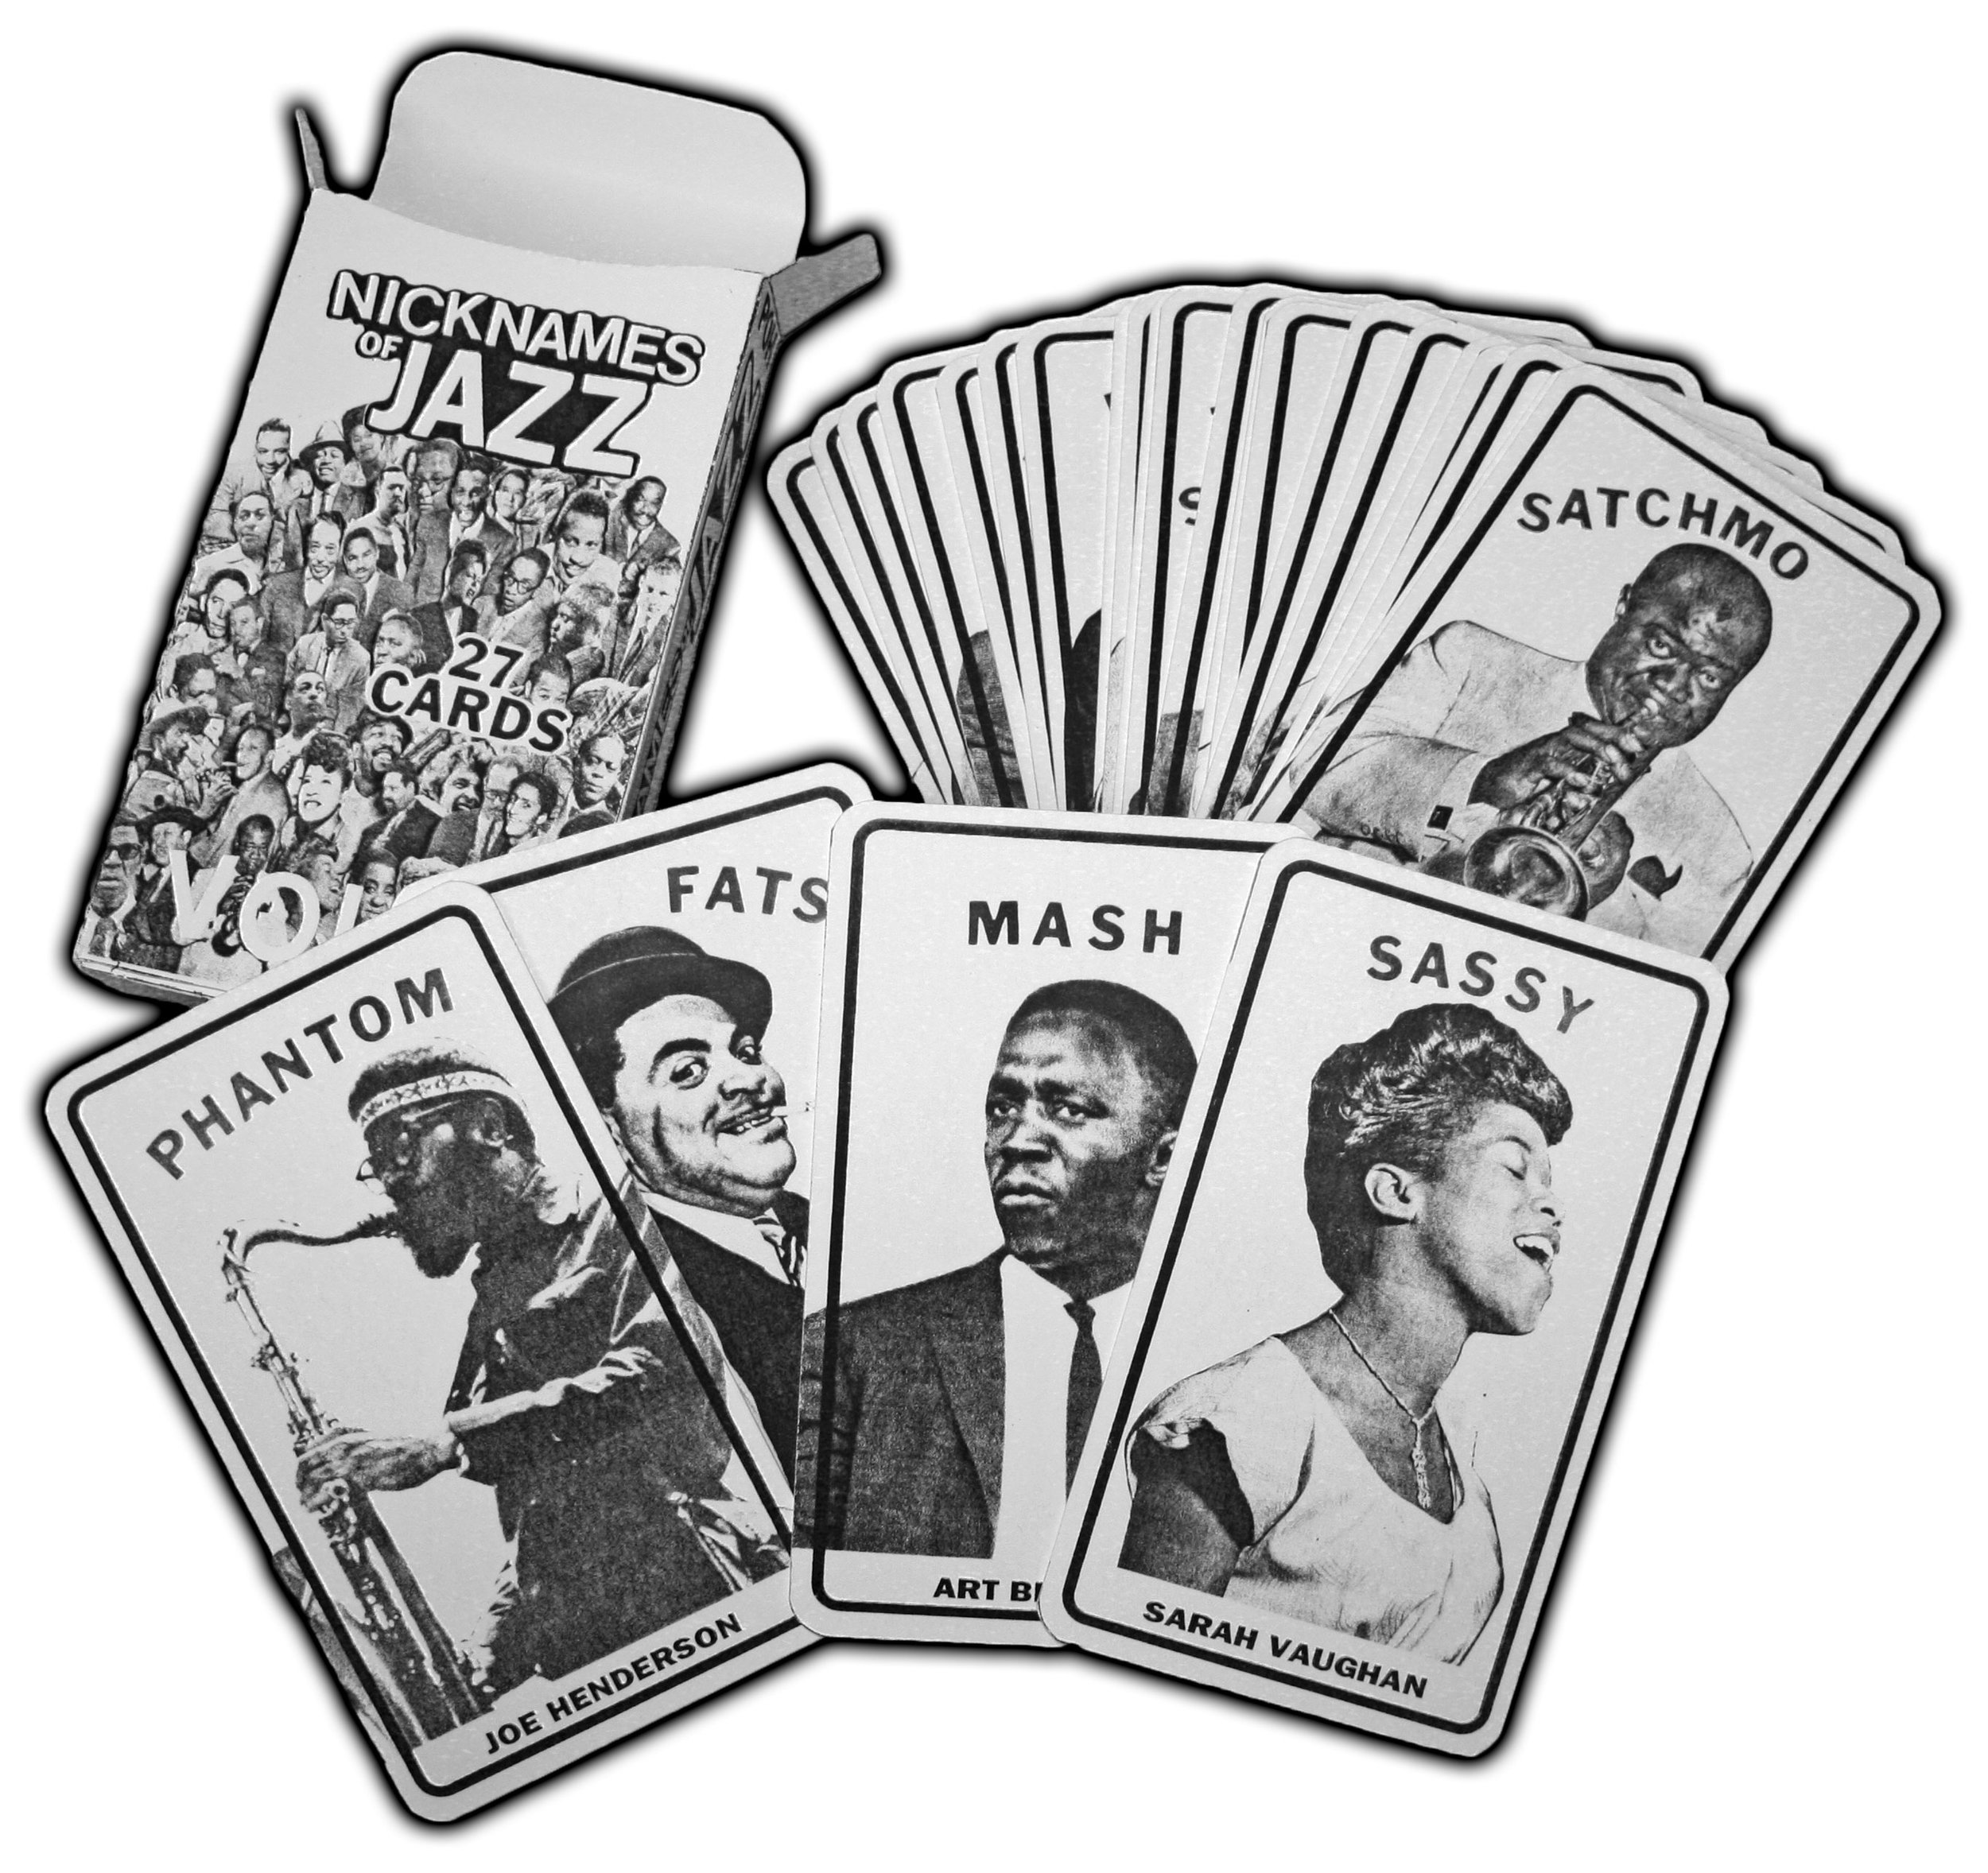 Nicknames-Of-Jazz-Product-Photo.jpg